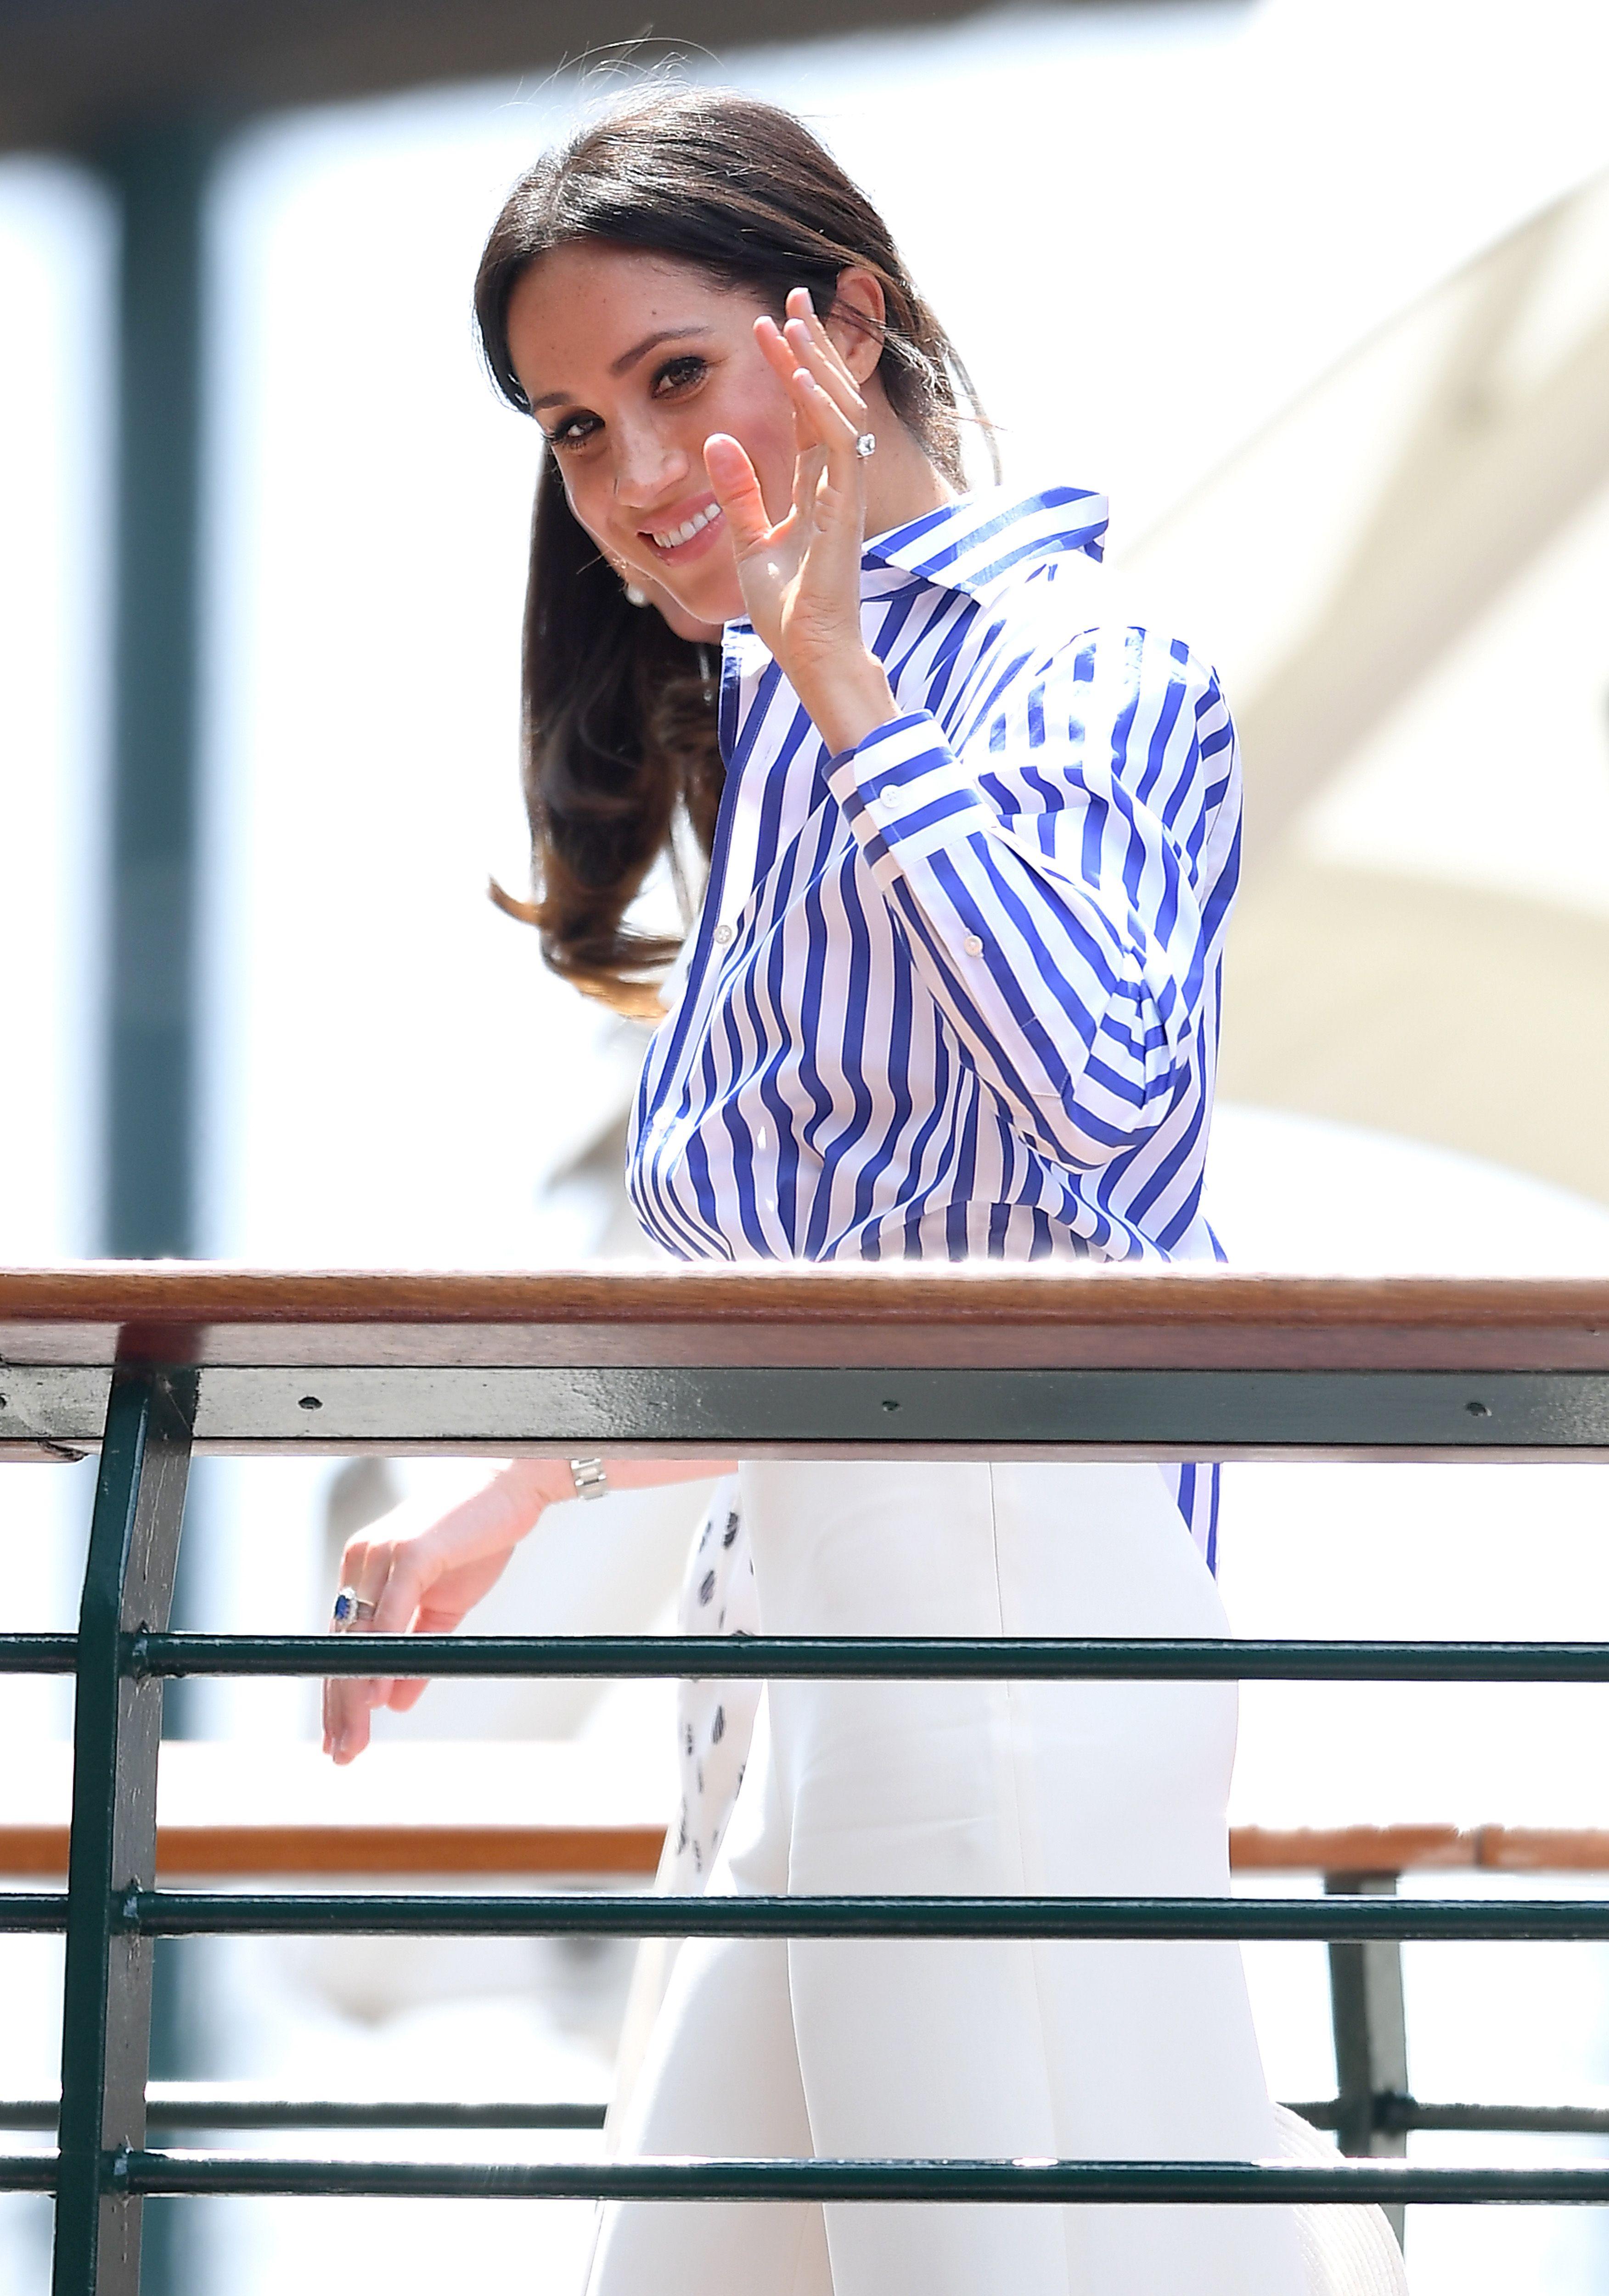 Meghan Markle Wears Striped Shirt White Pants to Watch